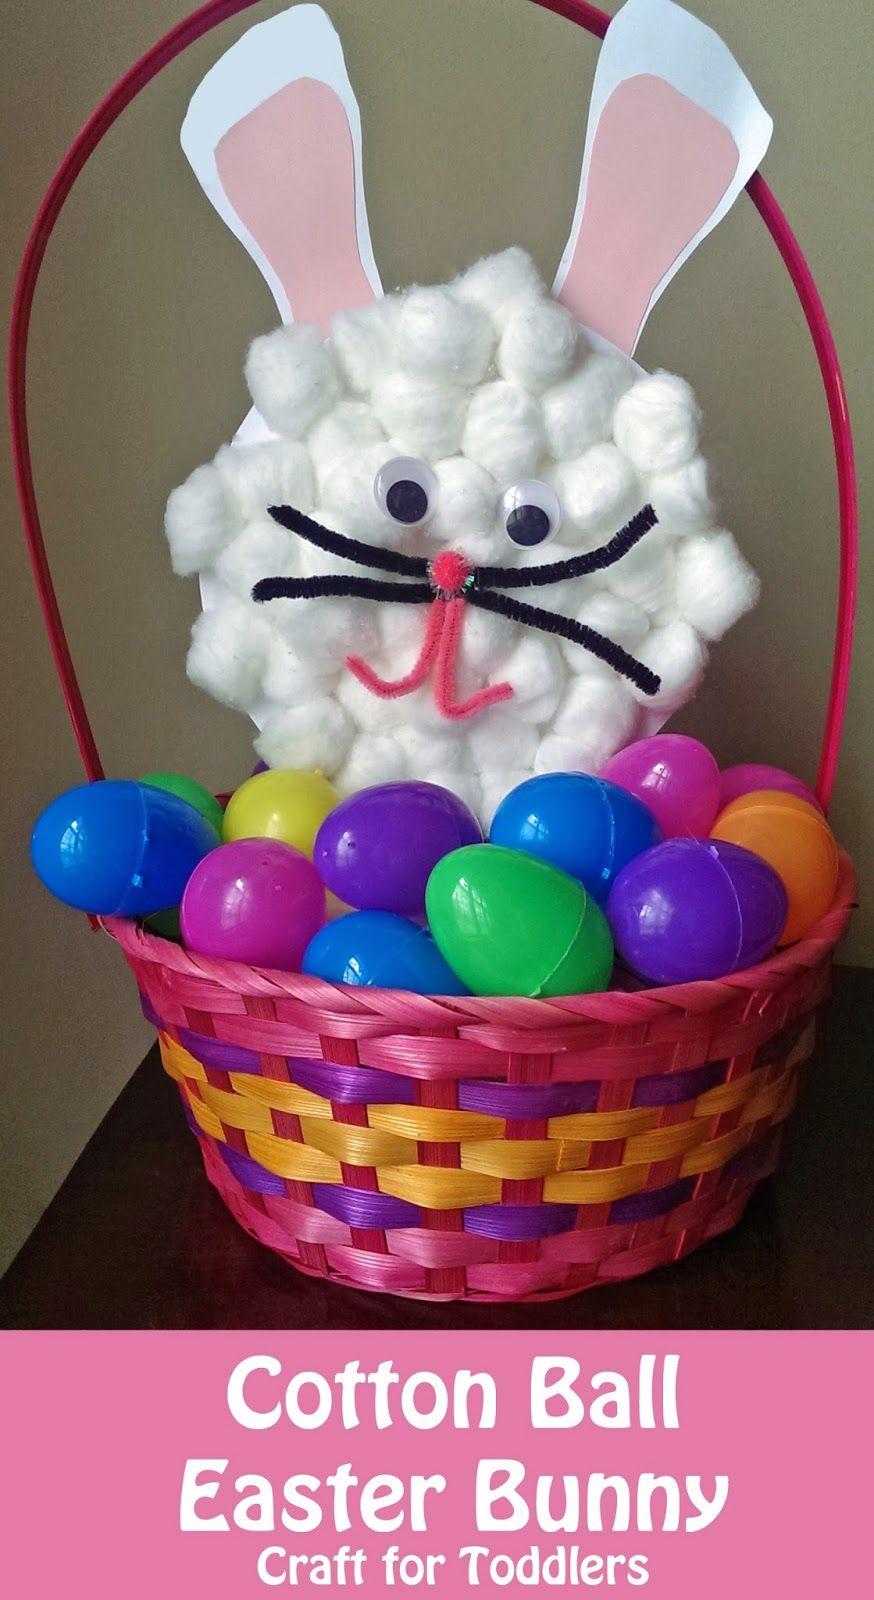 Cotton Ball Bunny Easter Craft